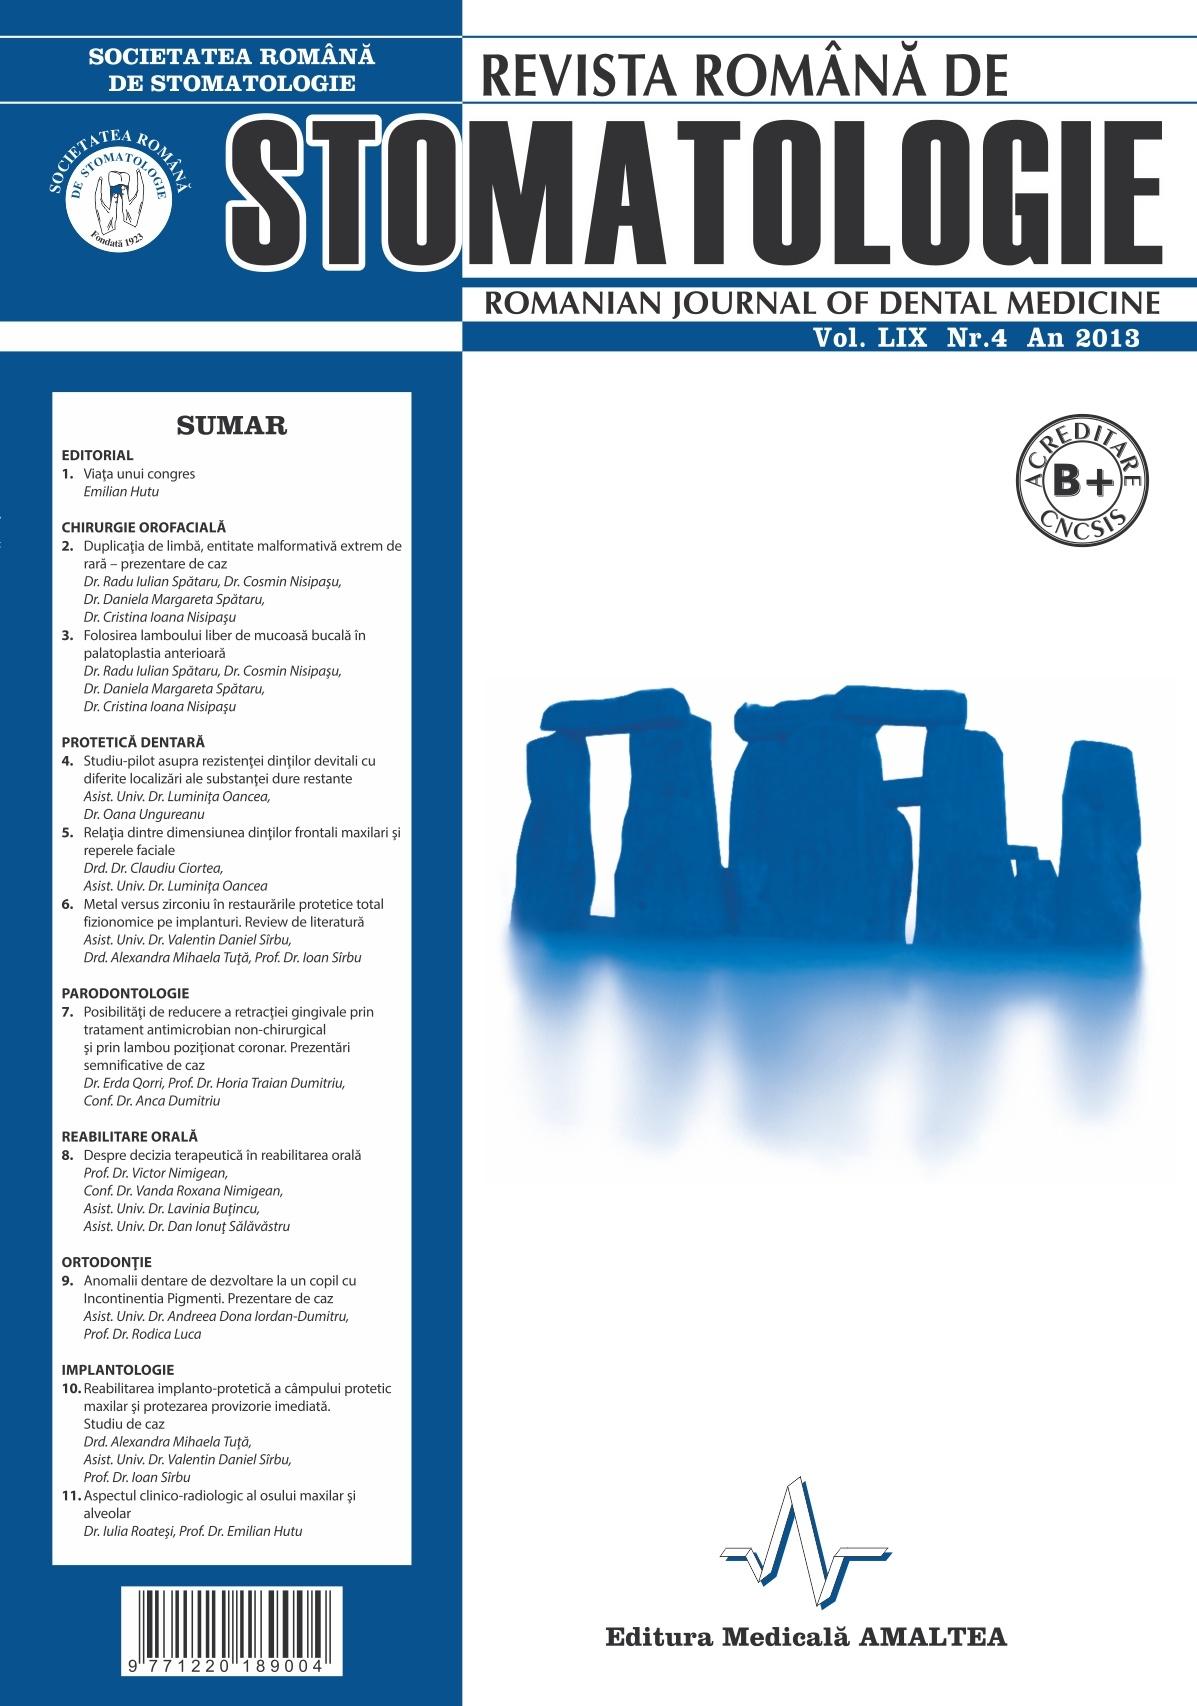 Revista Romana de STOMATOLOGIE - Romanian Journal of Stomatology, Vol. LIX, Nr. 4, An 2013